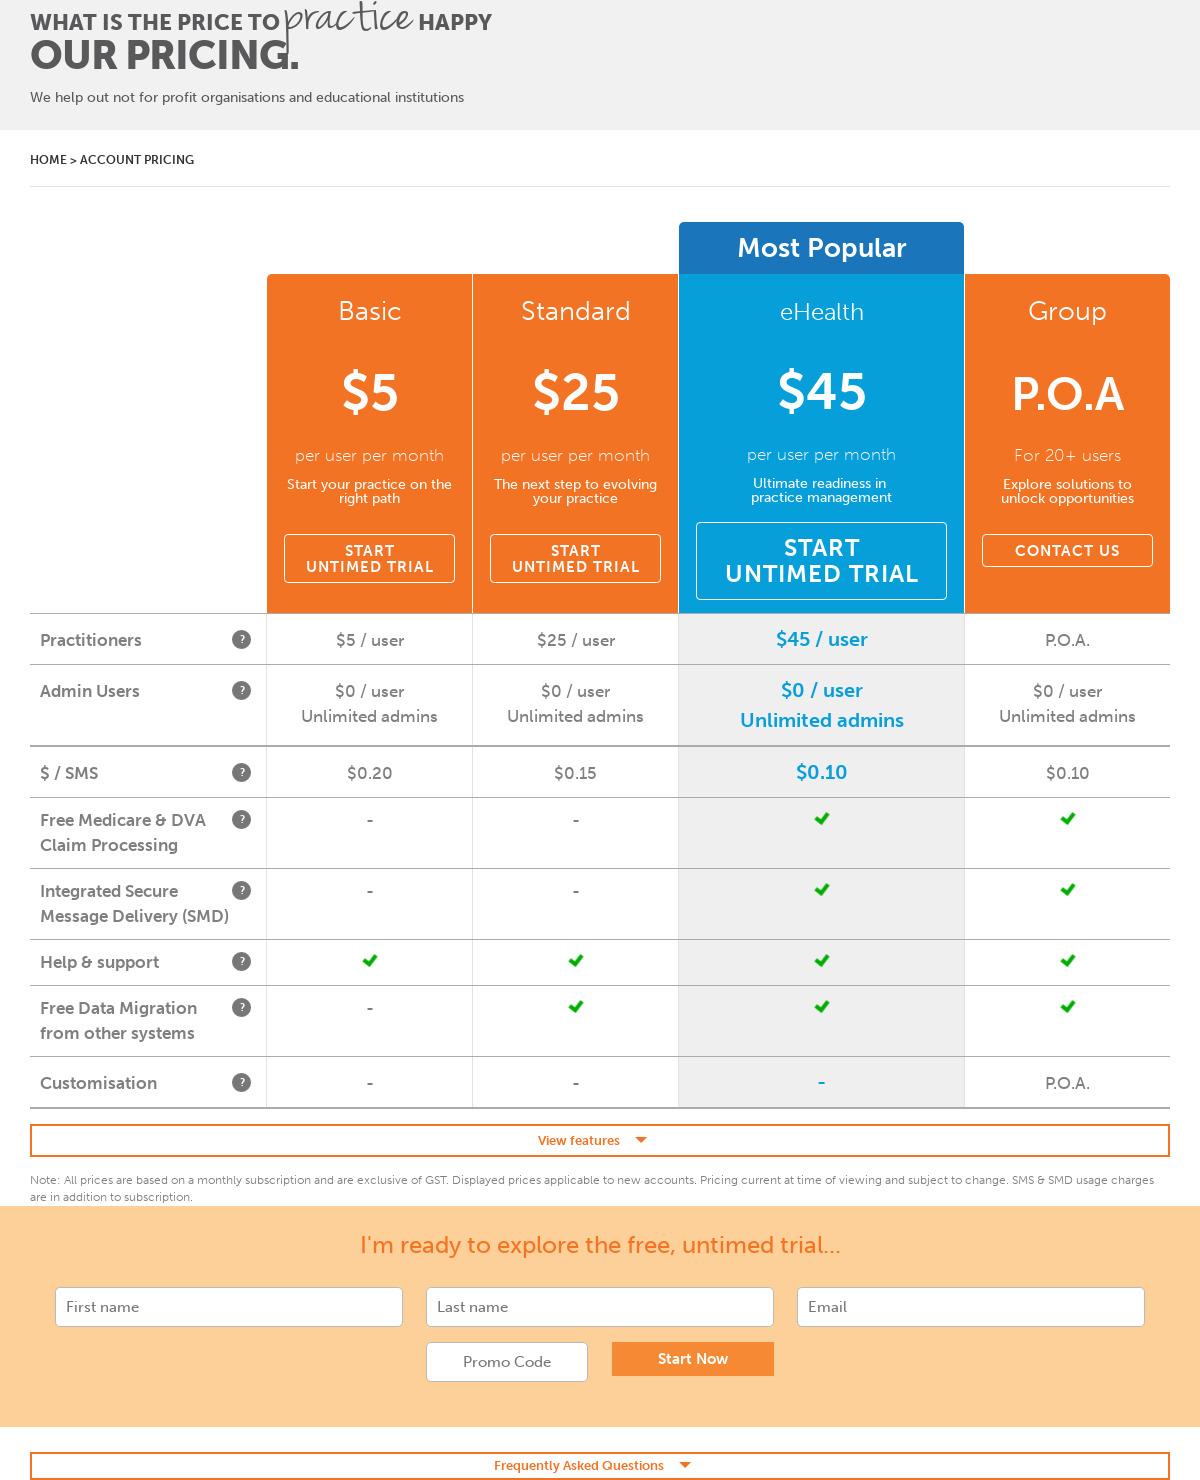 CorePlus Pricing as of 2018-09-25